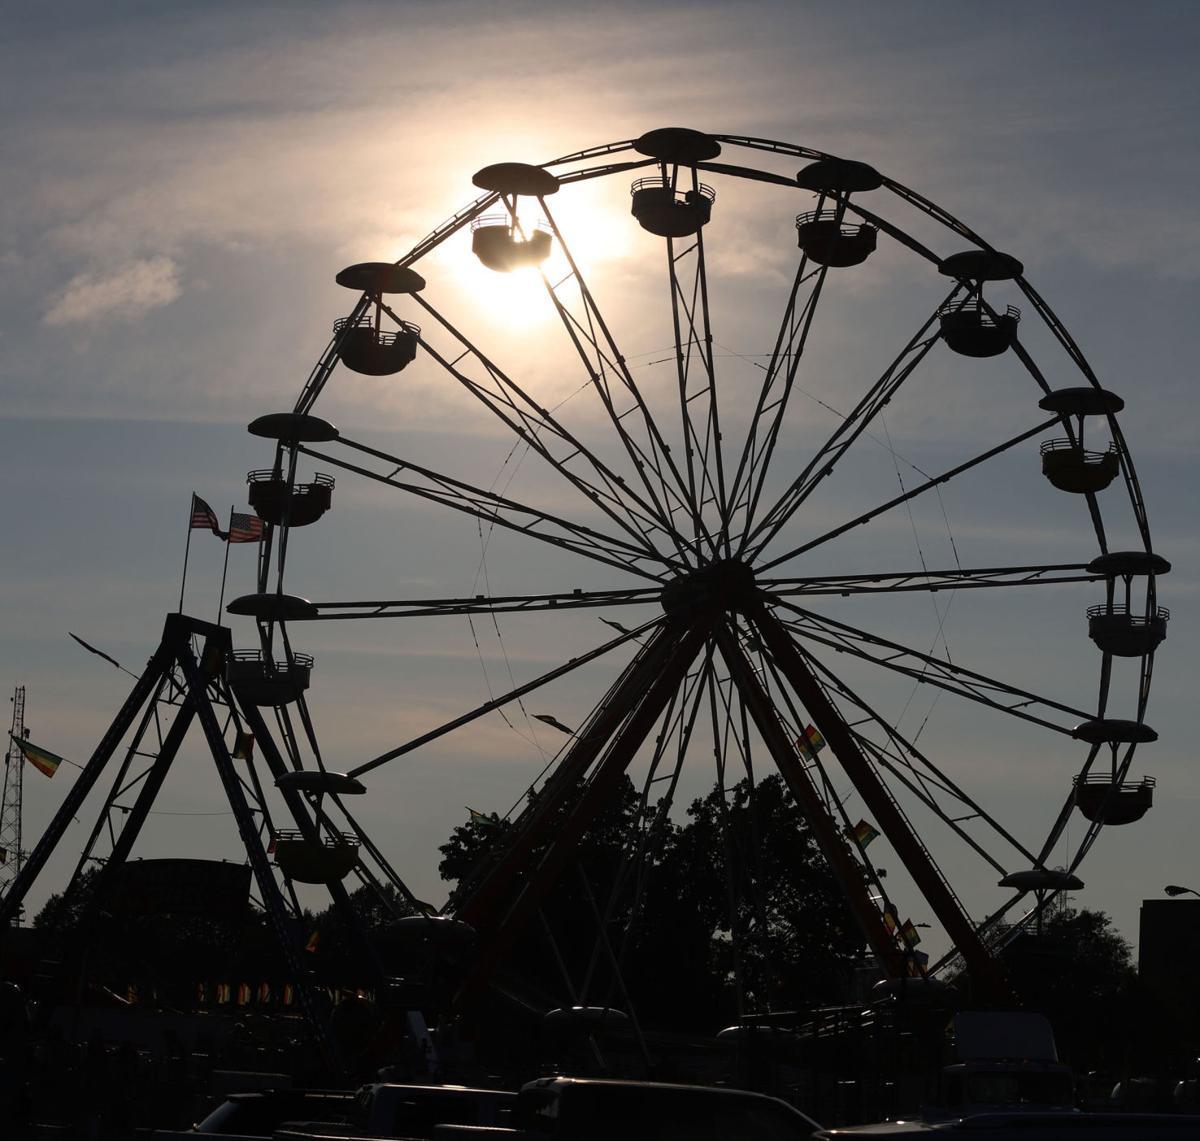 Celebration Ferris wheel silhouette 8.4.18.jpg